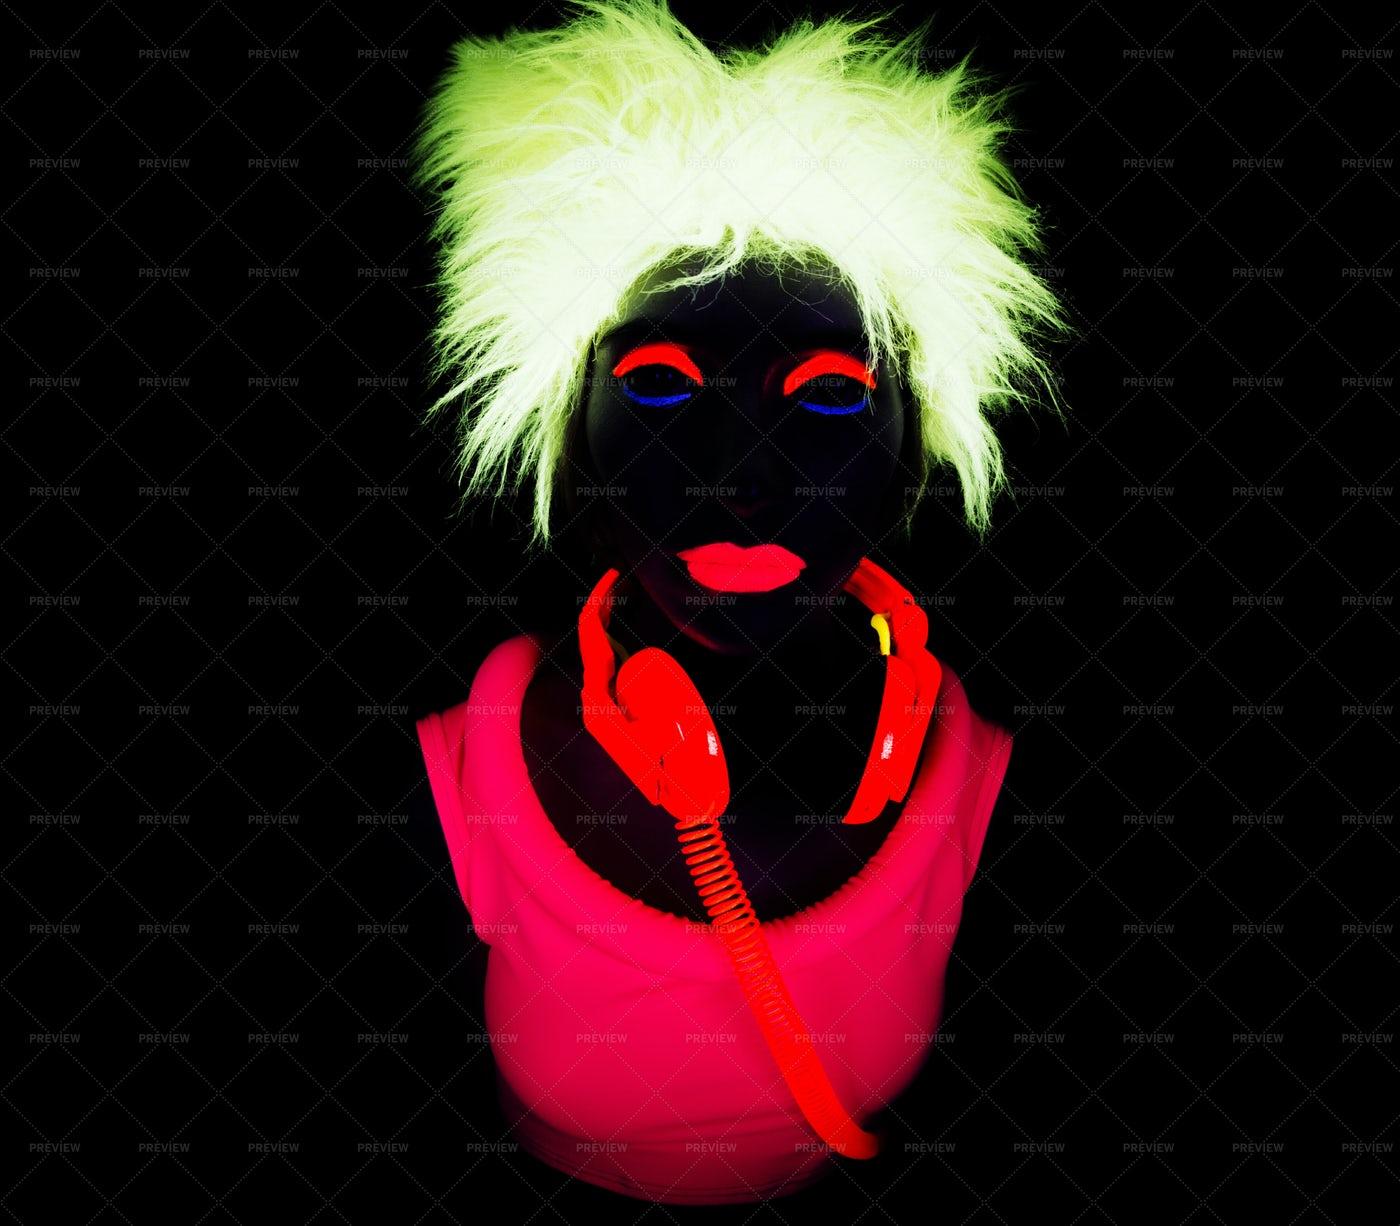 Neon Uv Glow Woman: Stock Photos